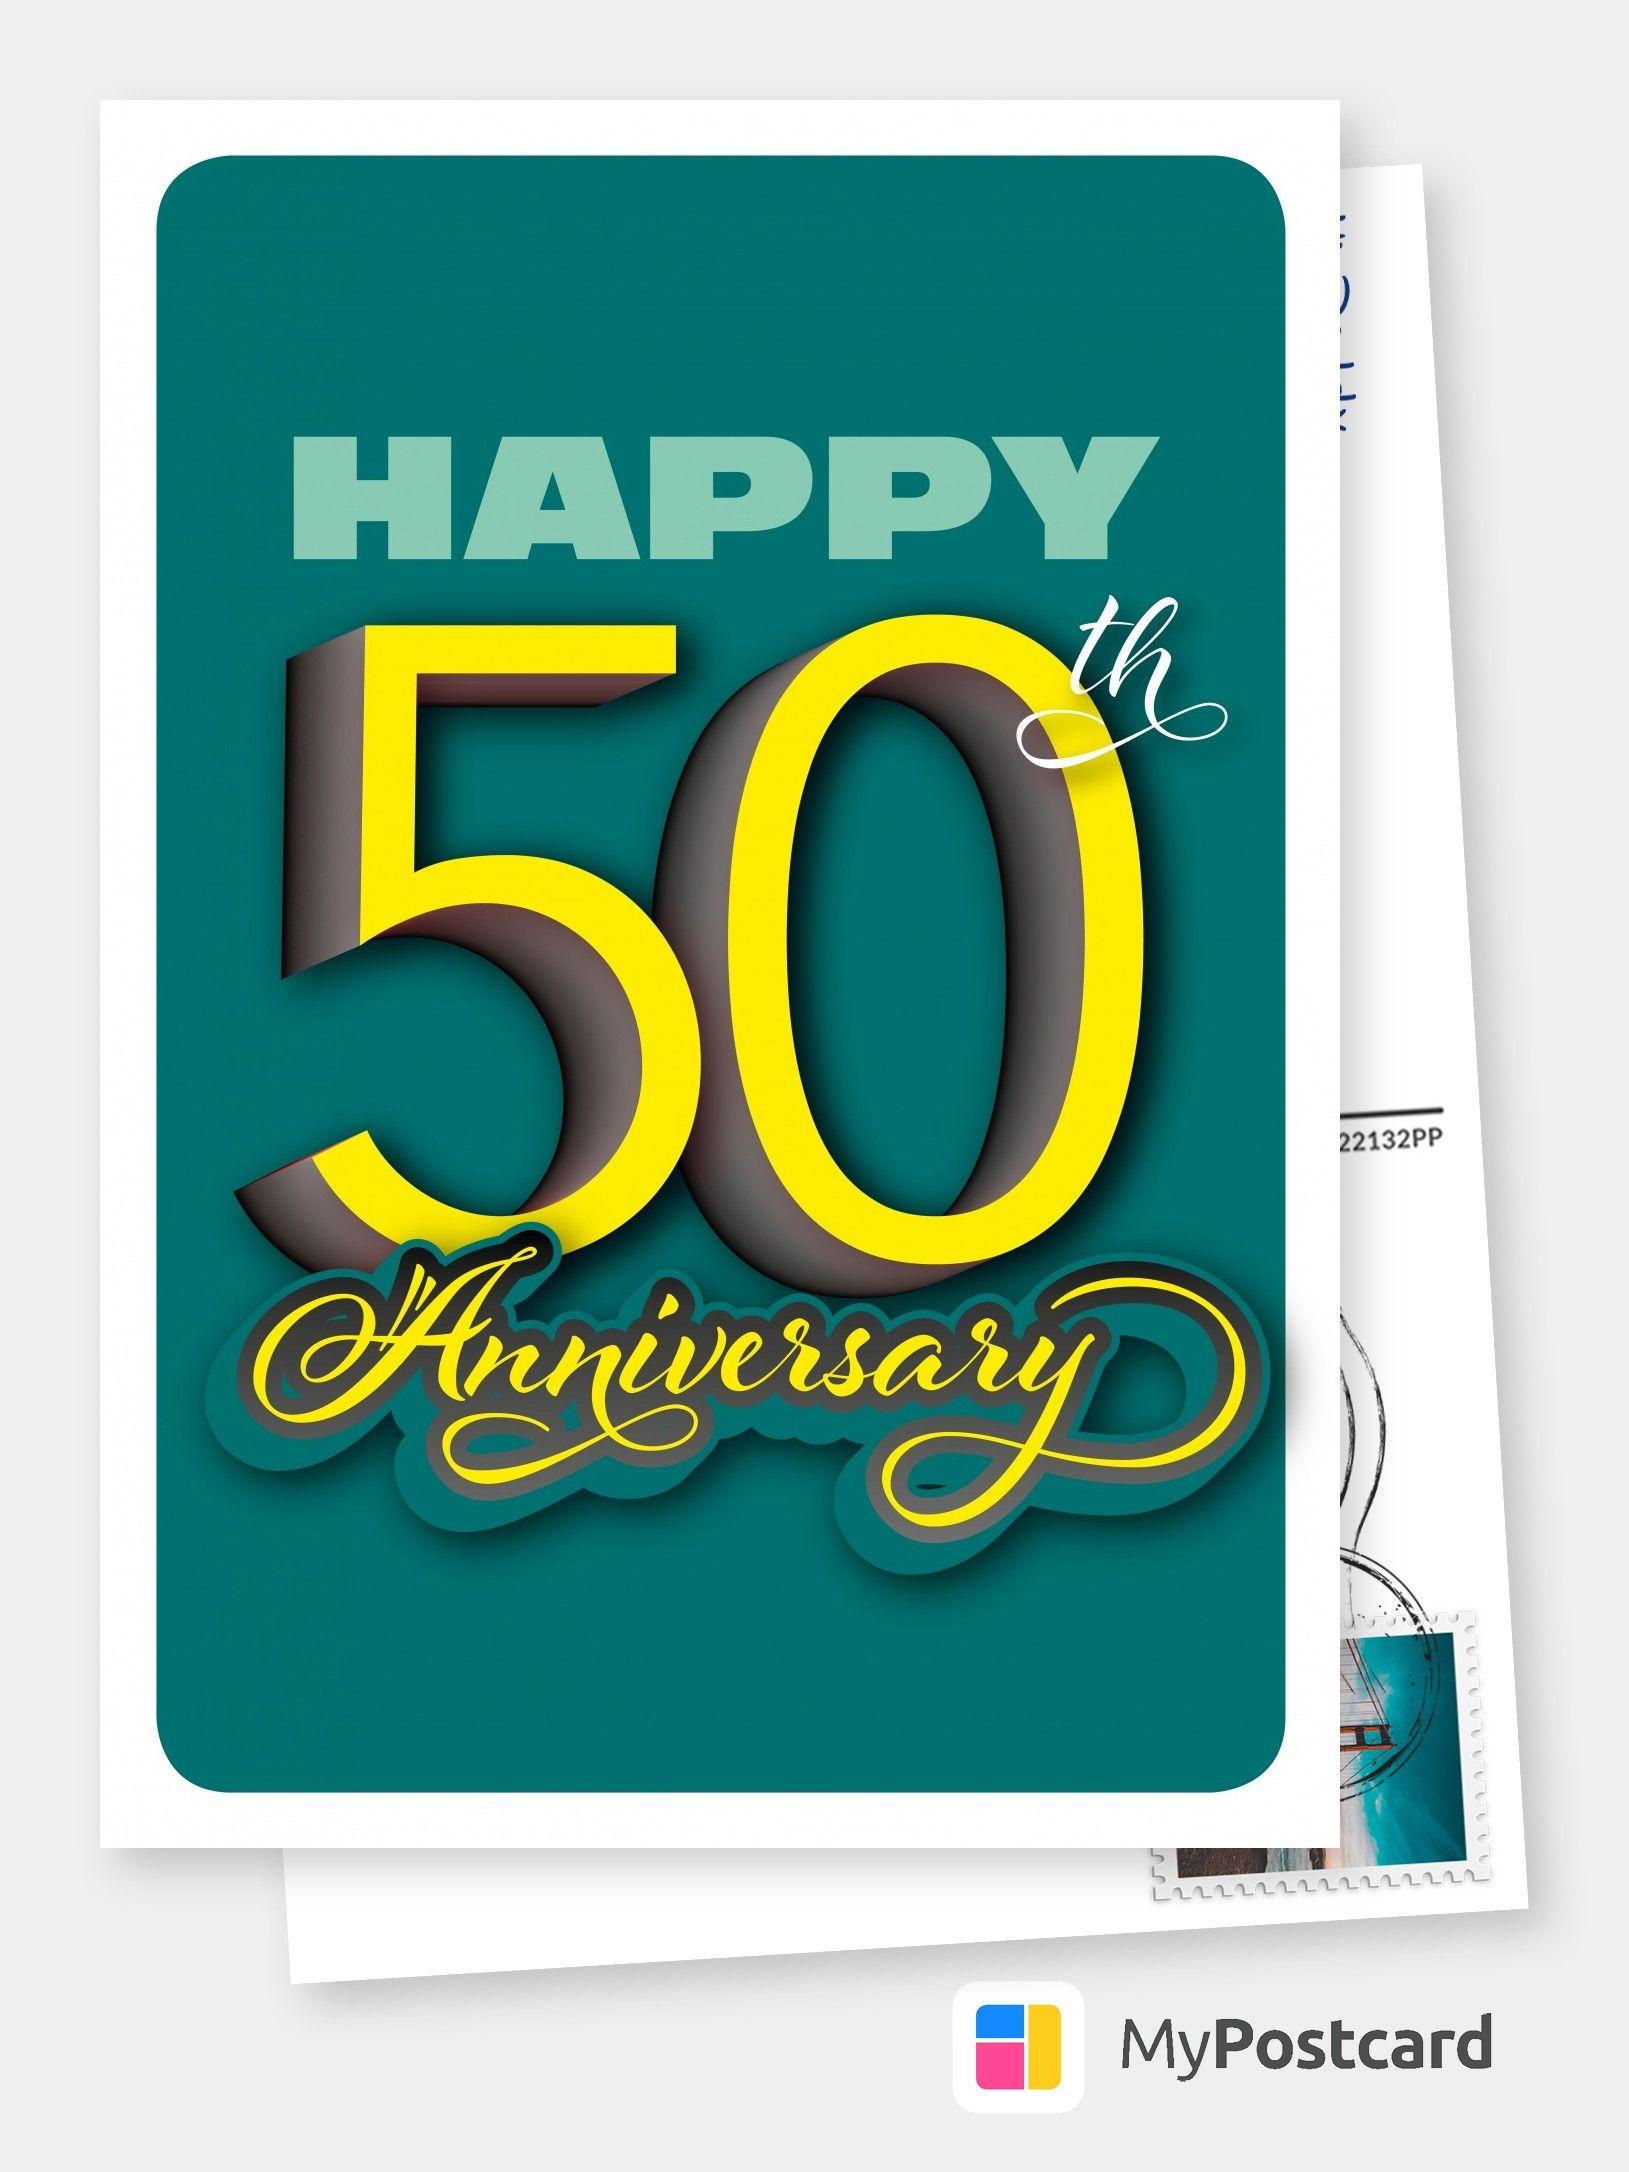 Happy 50th anniversary congratulation cards quotes